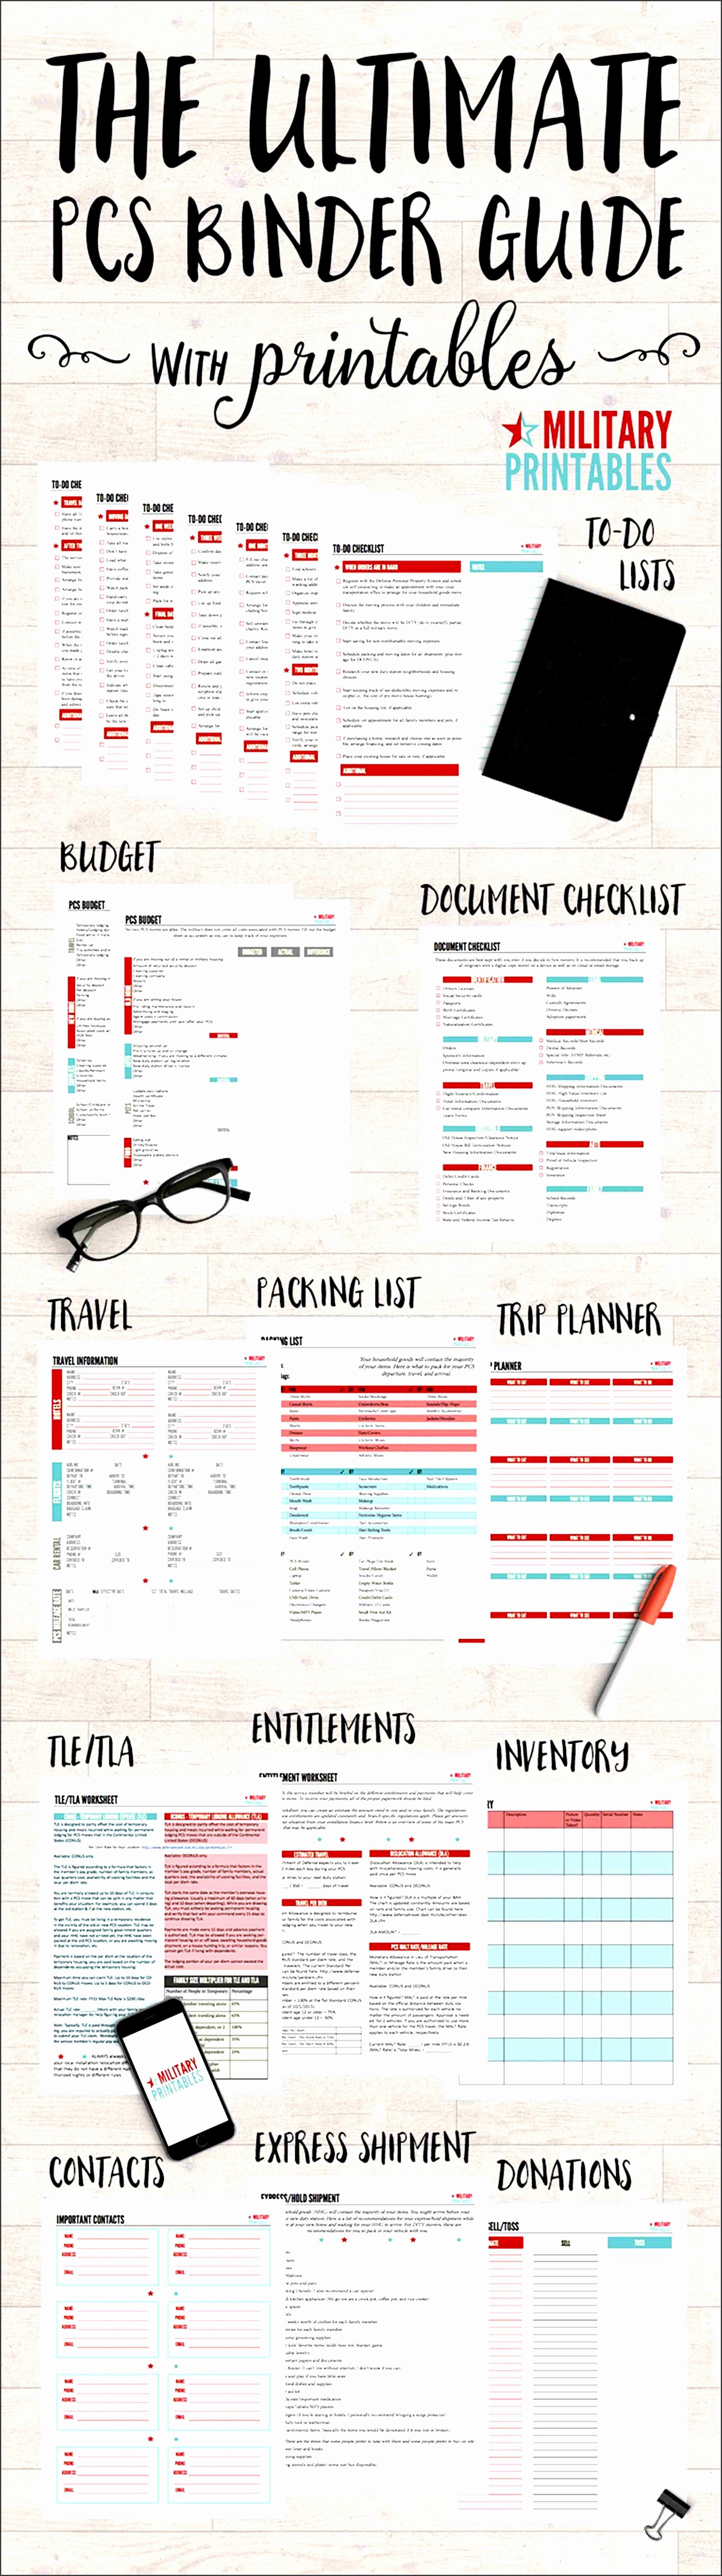 8 Moving Packing List Template SampleTemplatess SampleTemplatess